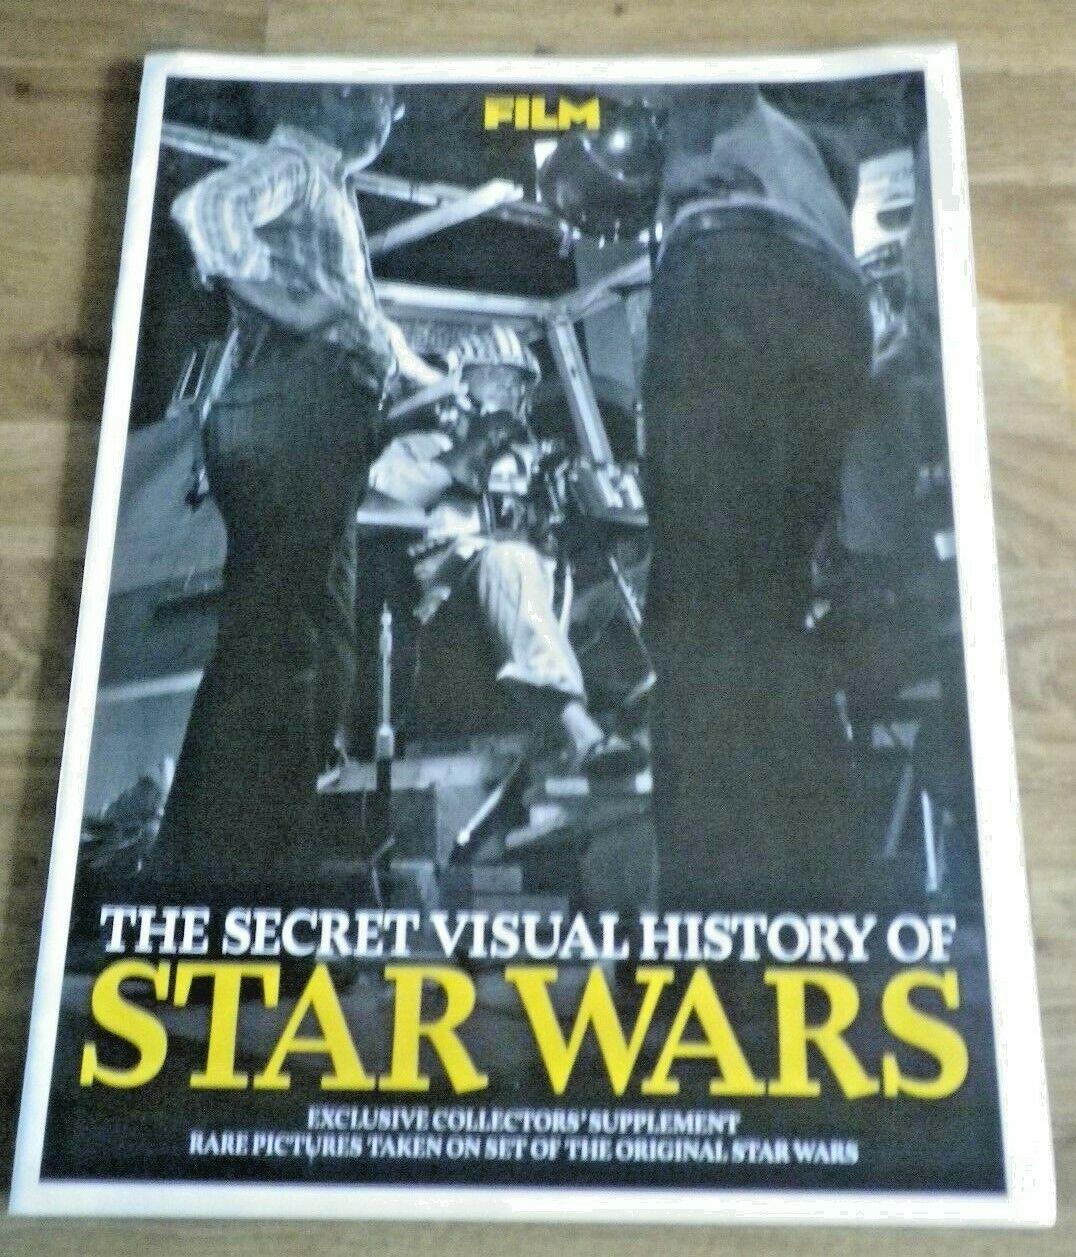 The Secret Visual History of Star Wars